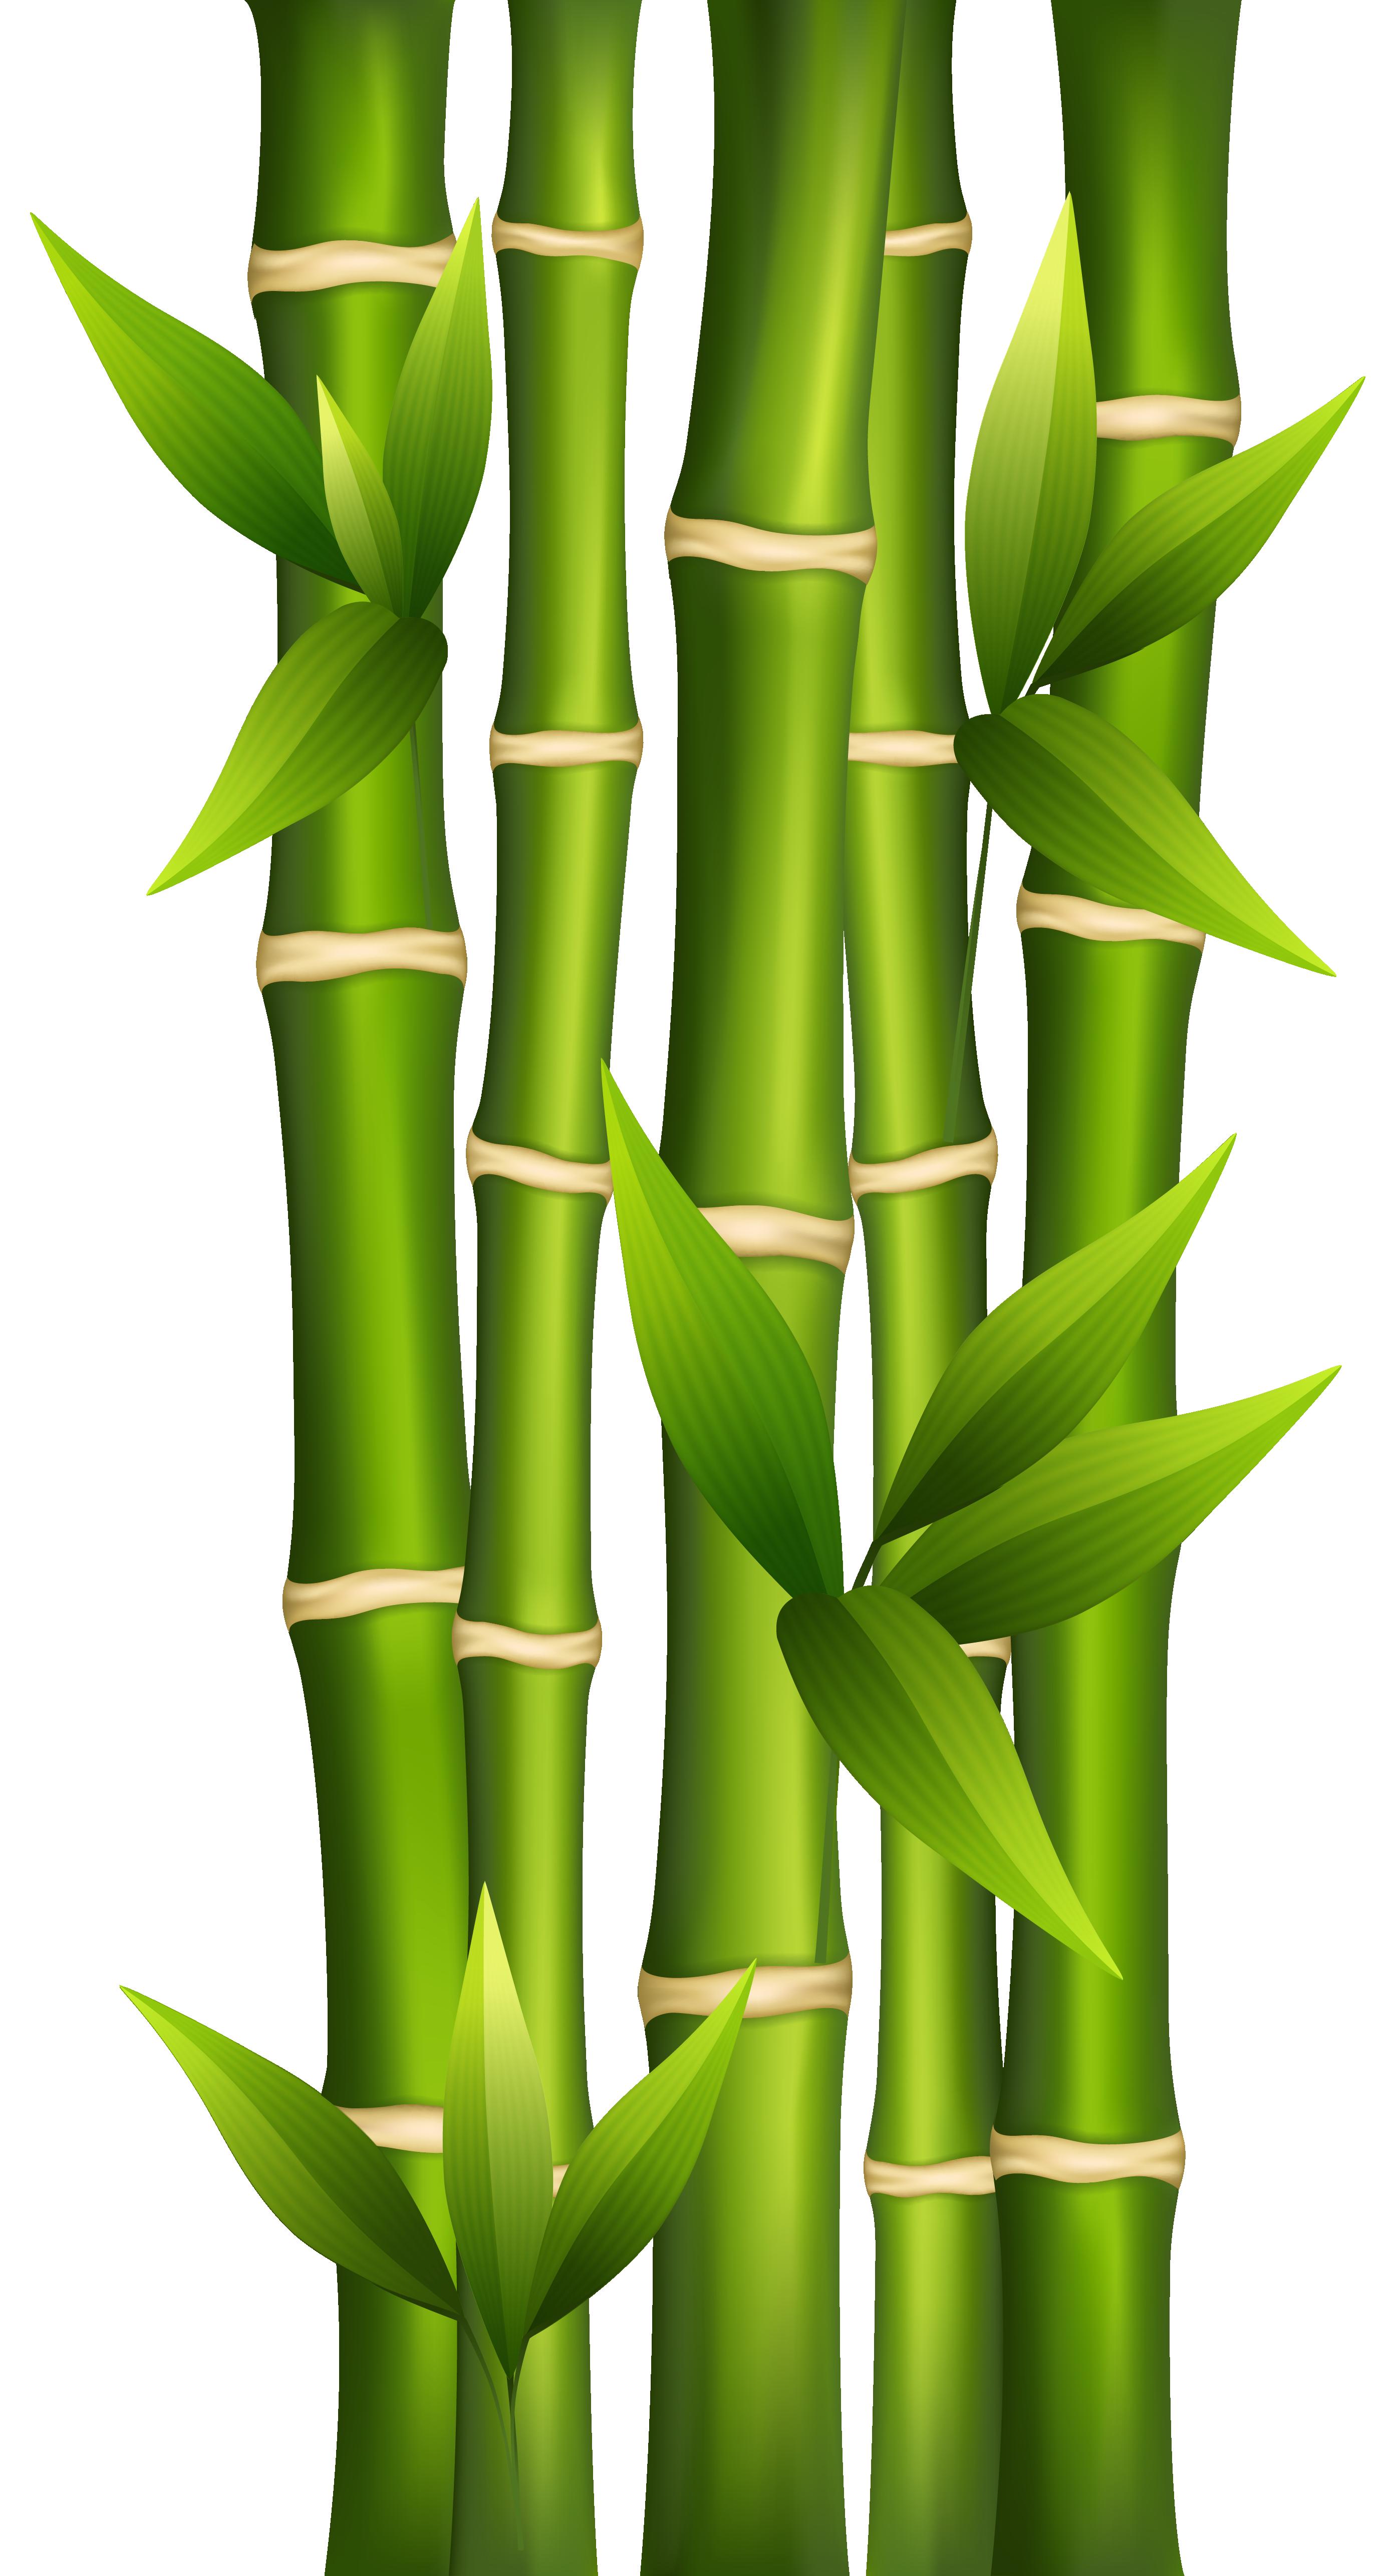 Bamboo clipart 2.